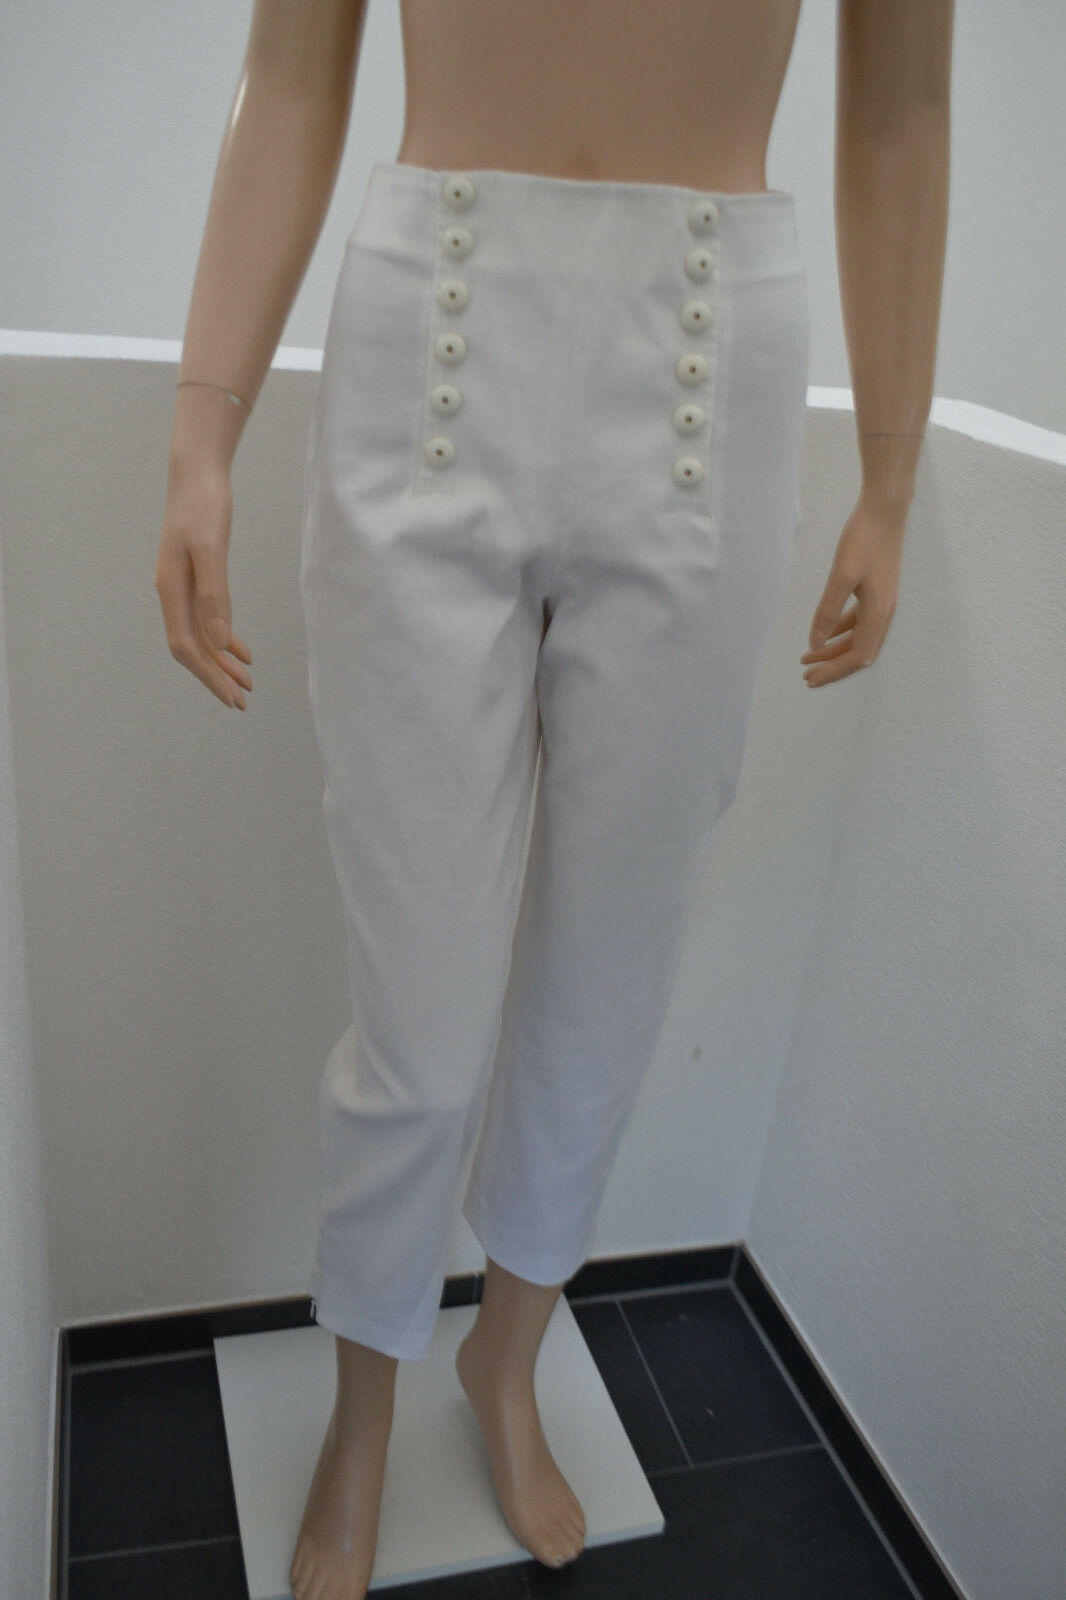 WOLFORD Sailors Capri Hose Trousers modisch modern weiß 38